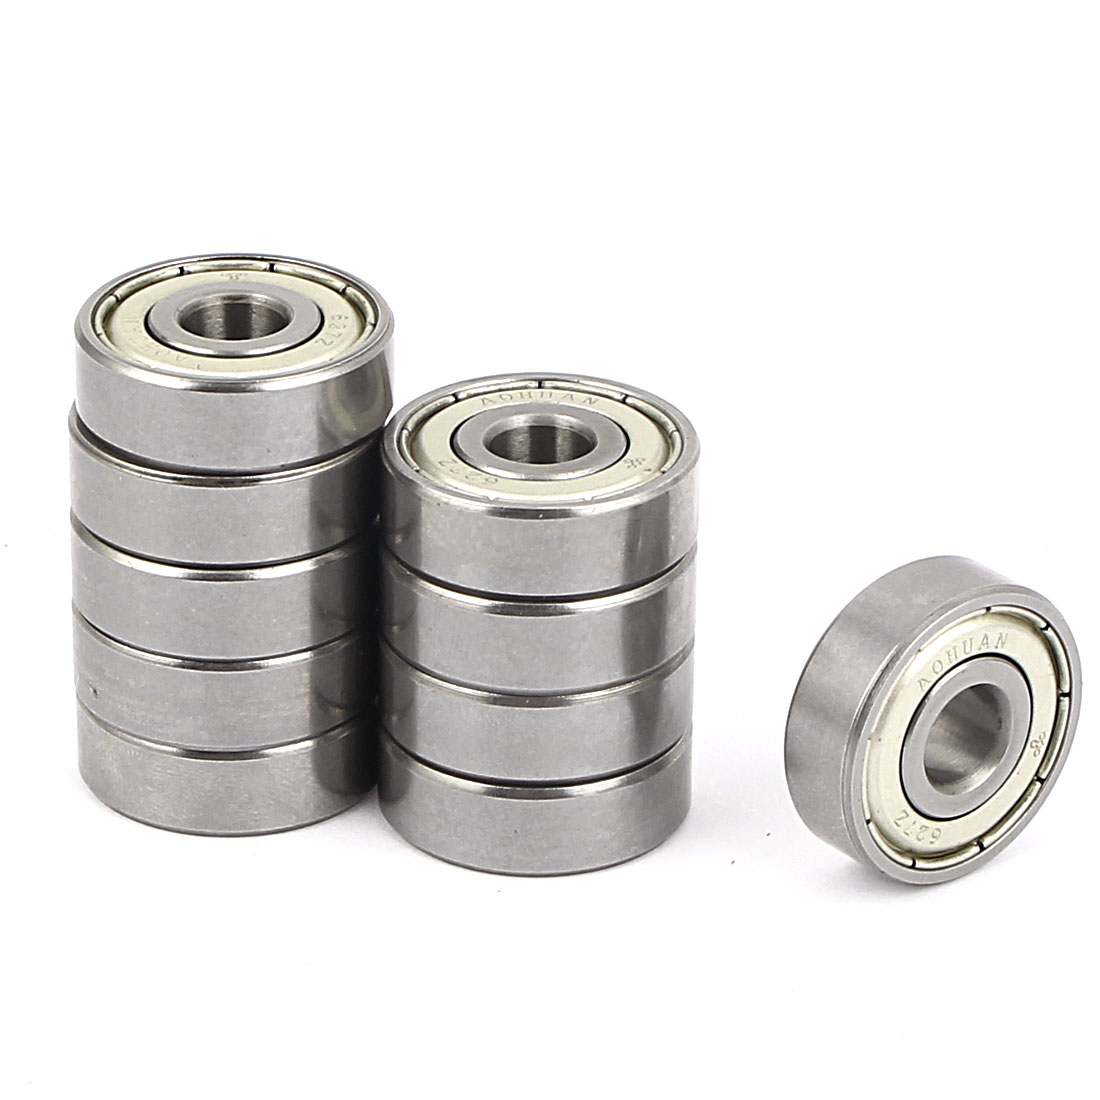 627Z Model 22mm x 7mm x 7mm Double Shielded Metal Deep Groove Guide Pulley Rail Ball Wheel Bearings Silver Tone 10pcs